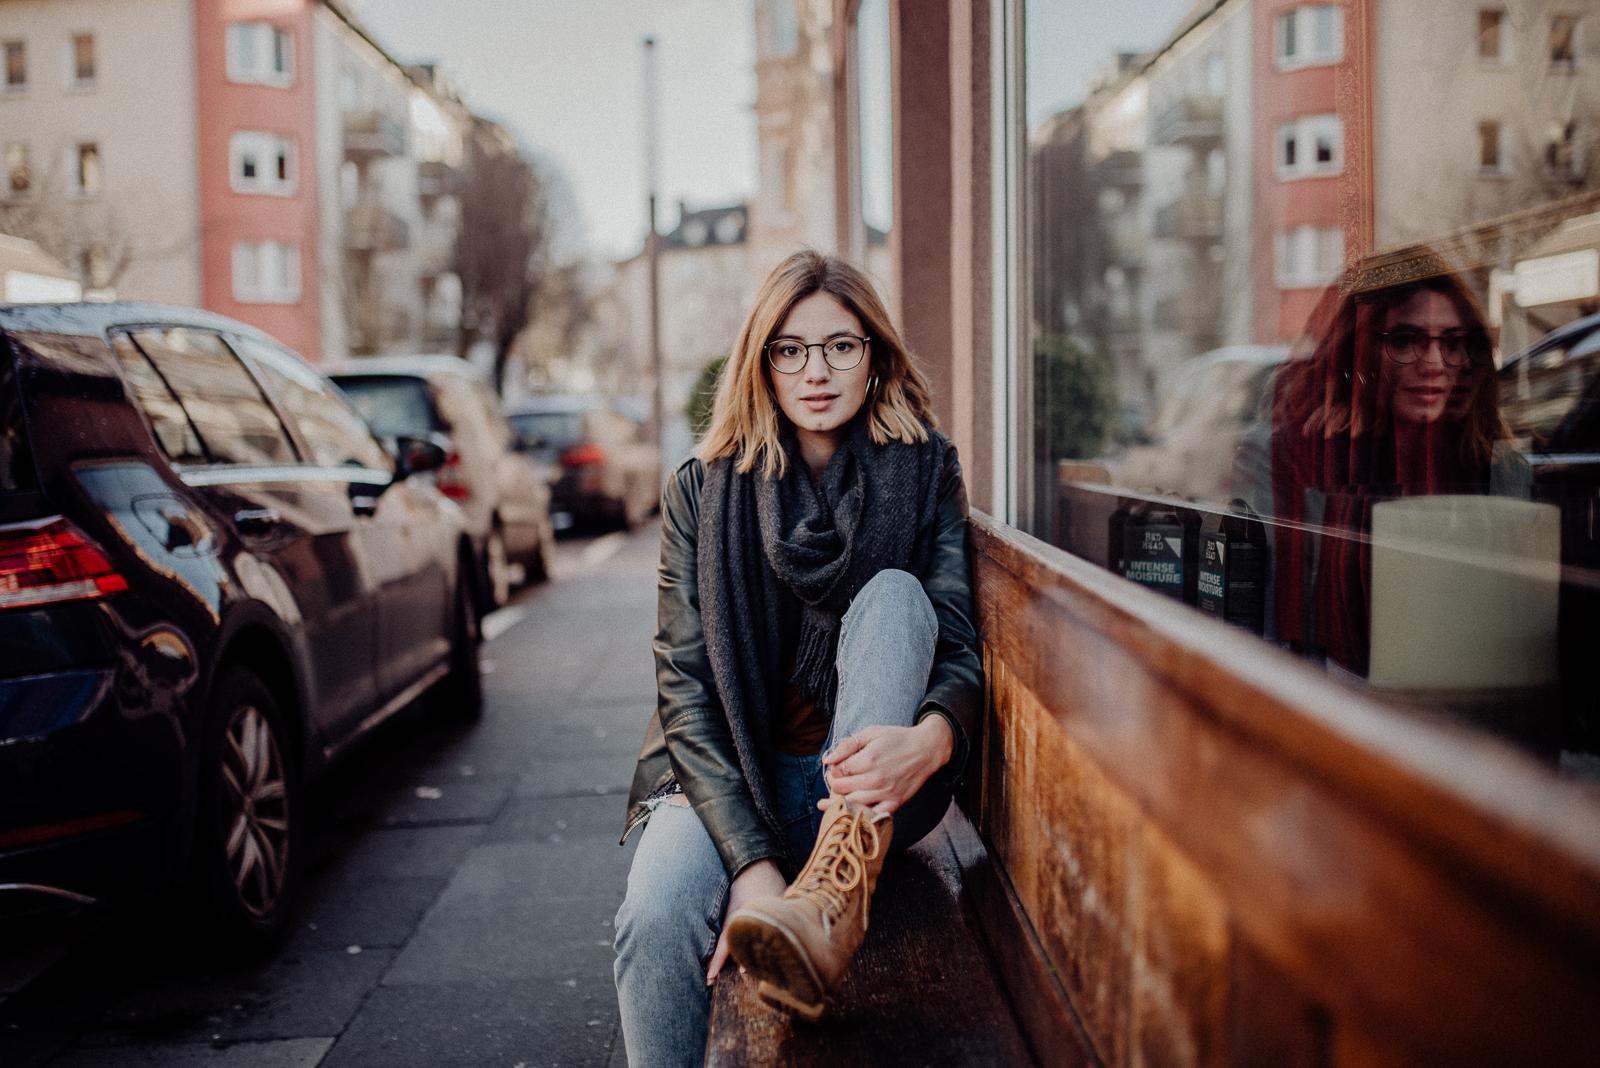 024-designparaplus-fotografin-witten-portrait-shooting-downtown